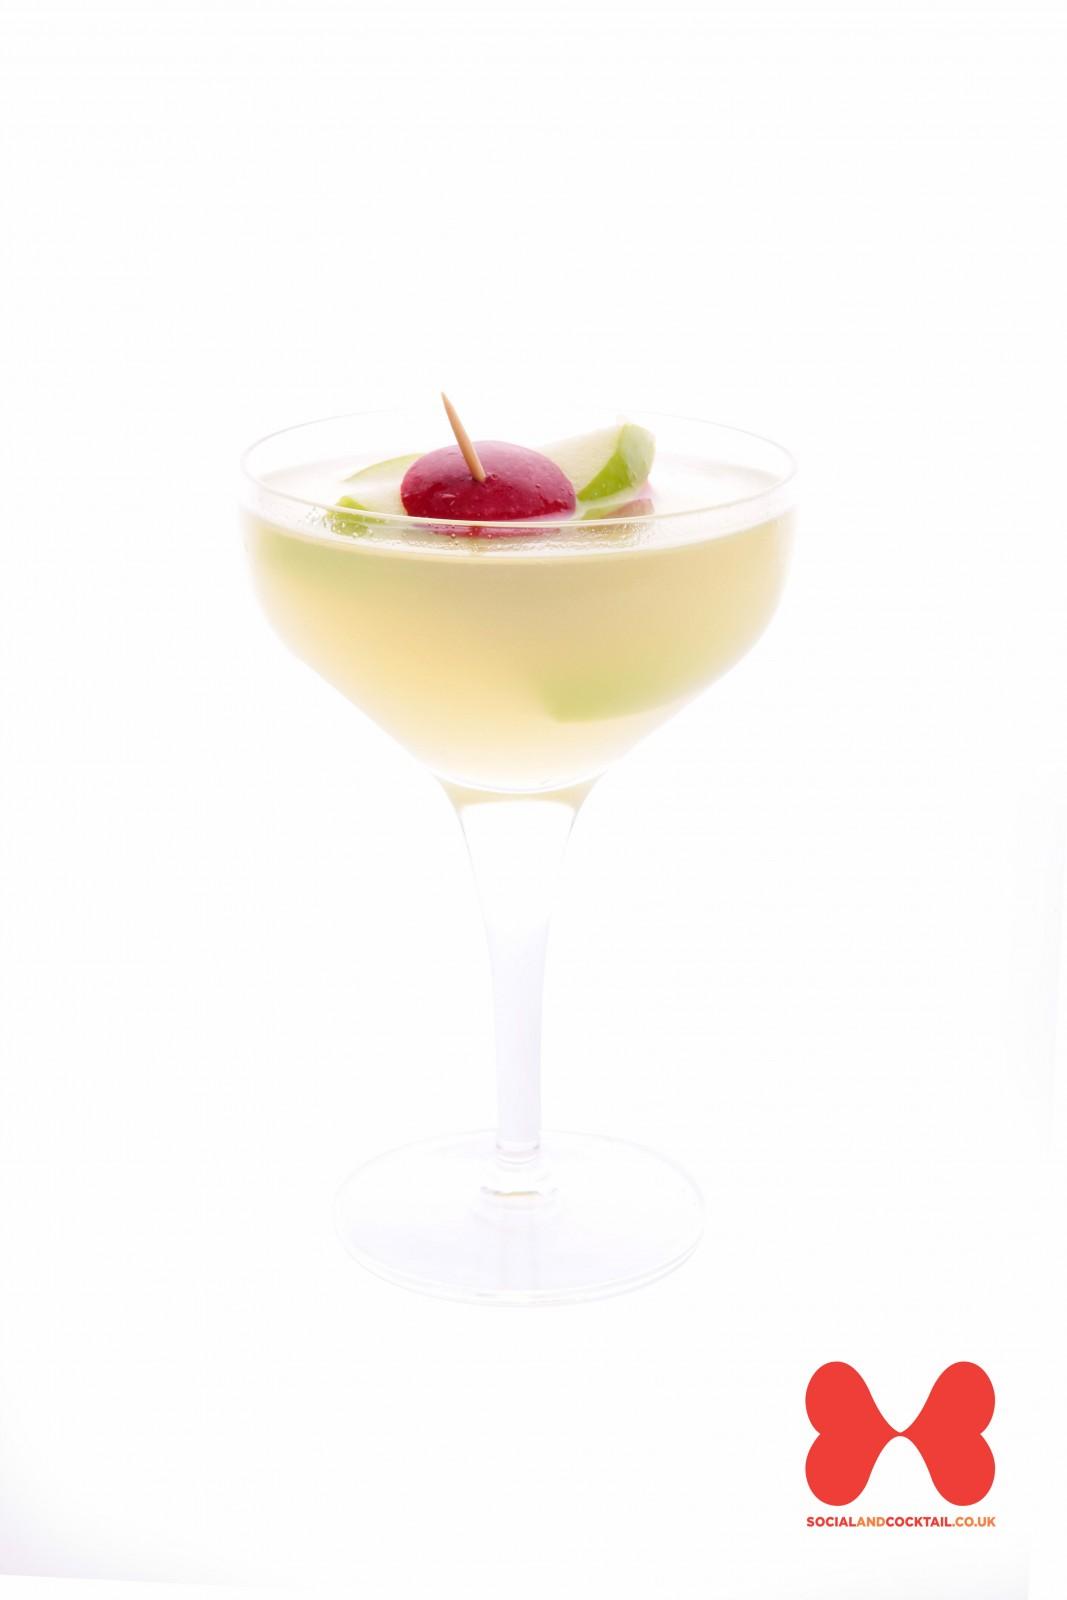 Apple Schnapps & Vodka Cocktails